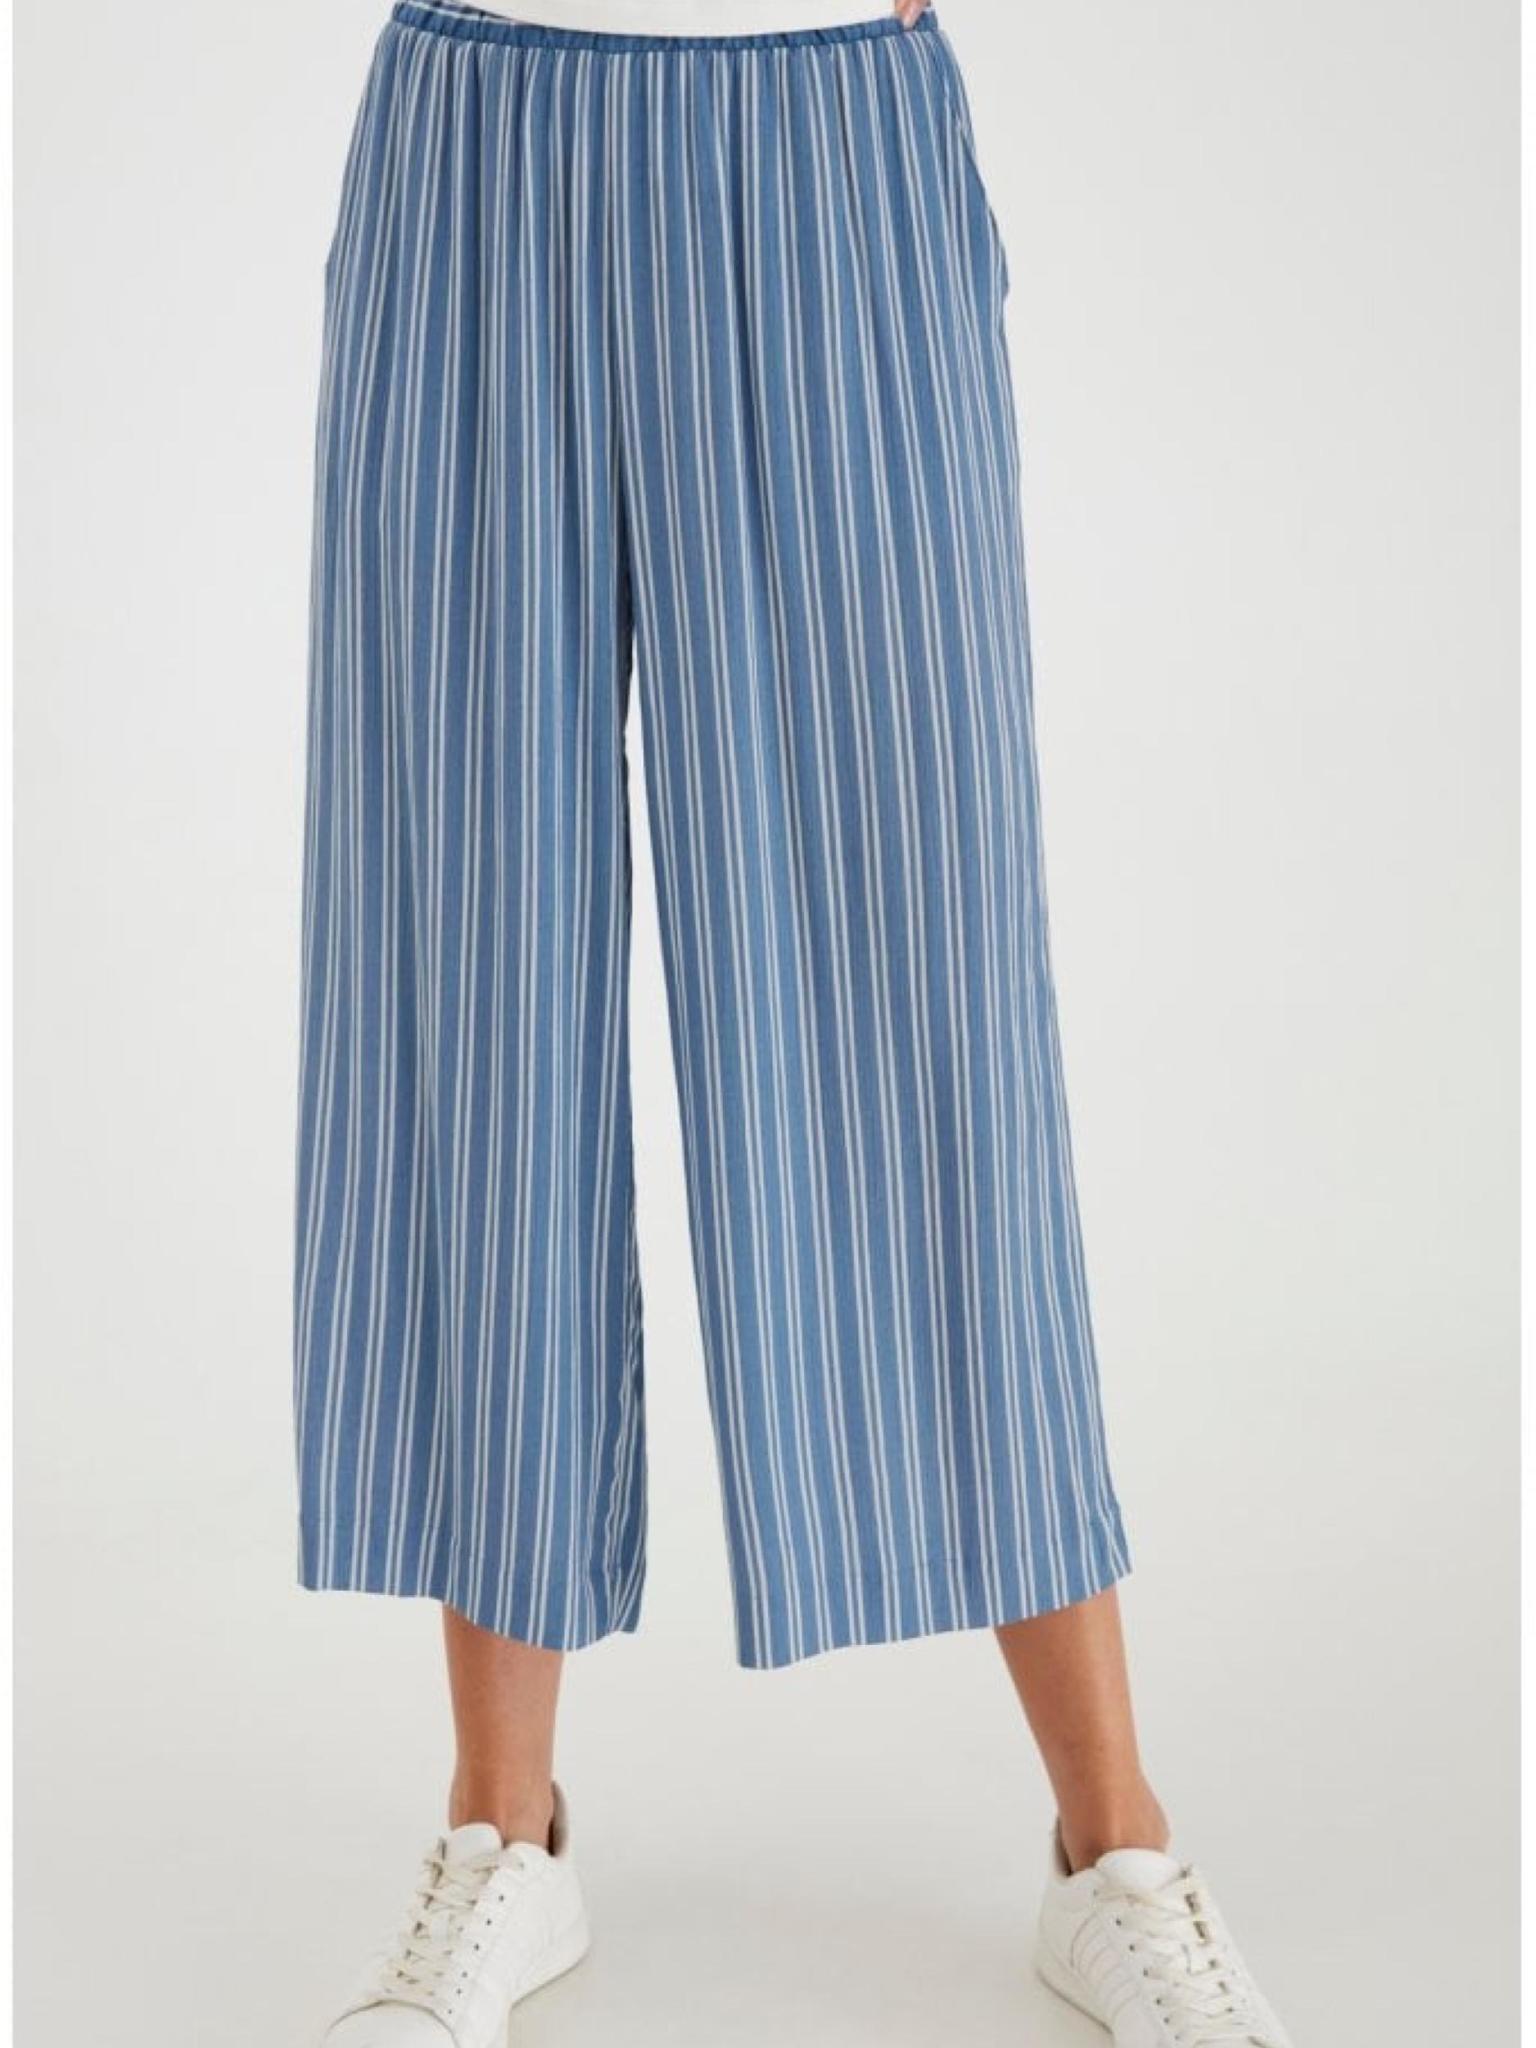 ICHI Marrakech Striped Pant